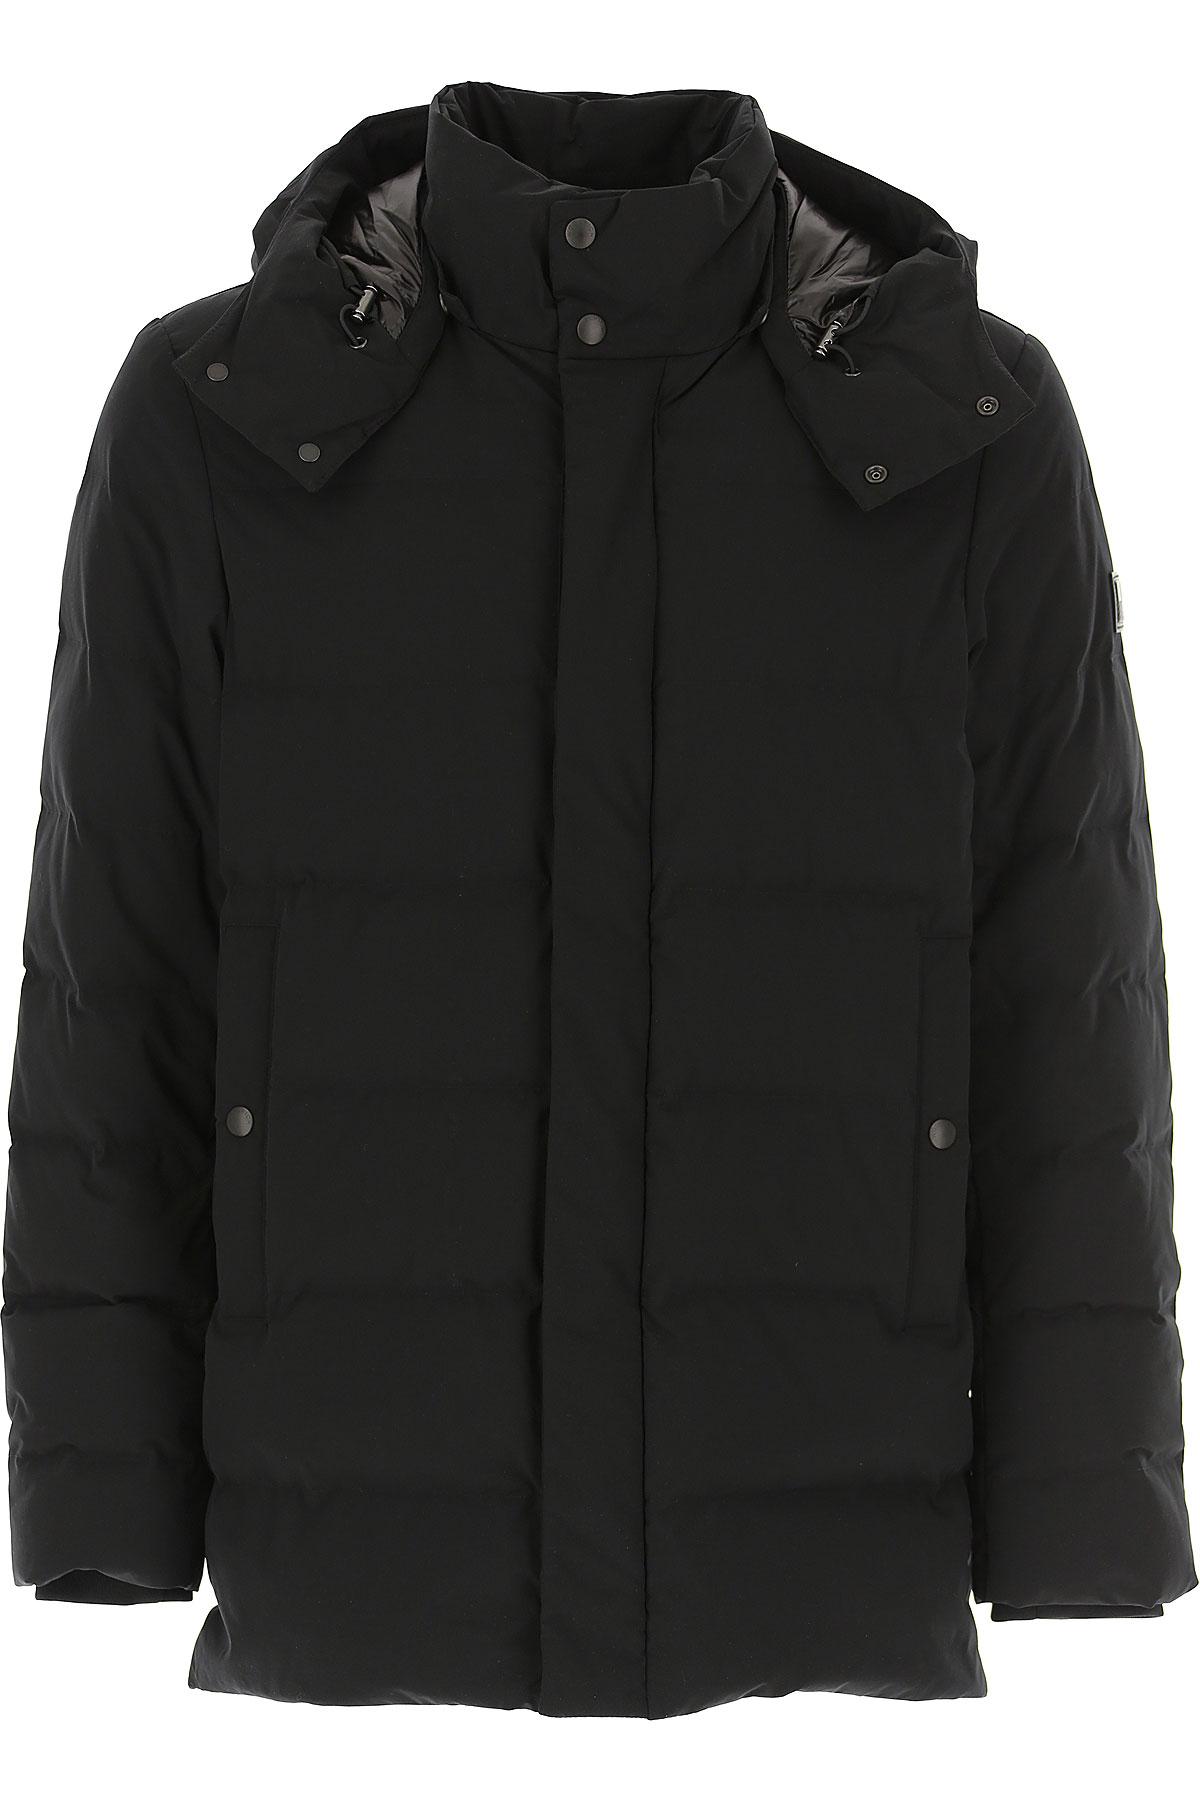 Woolrich Down Jacket for Men, Puffer Ski Jacket, Black, Down, 2019, L S XL XXL